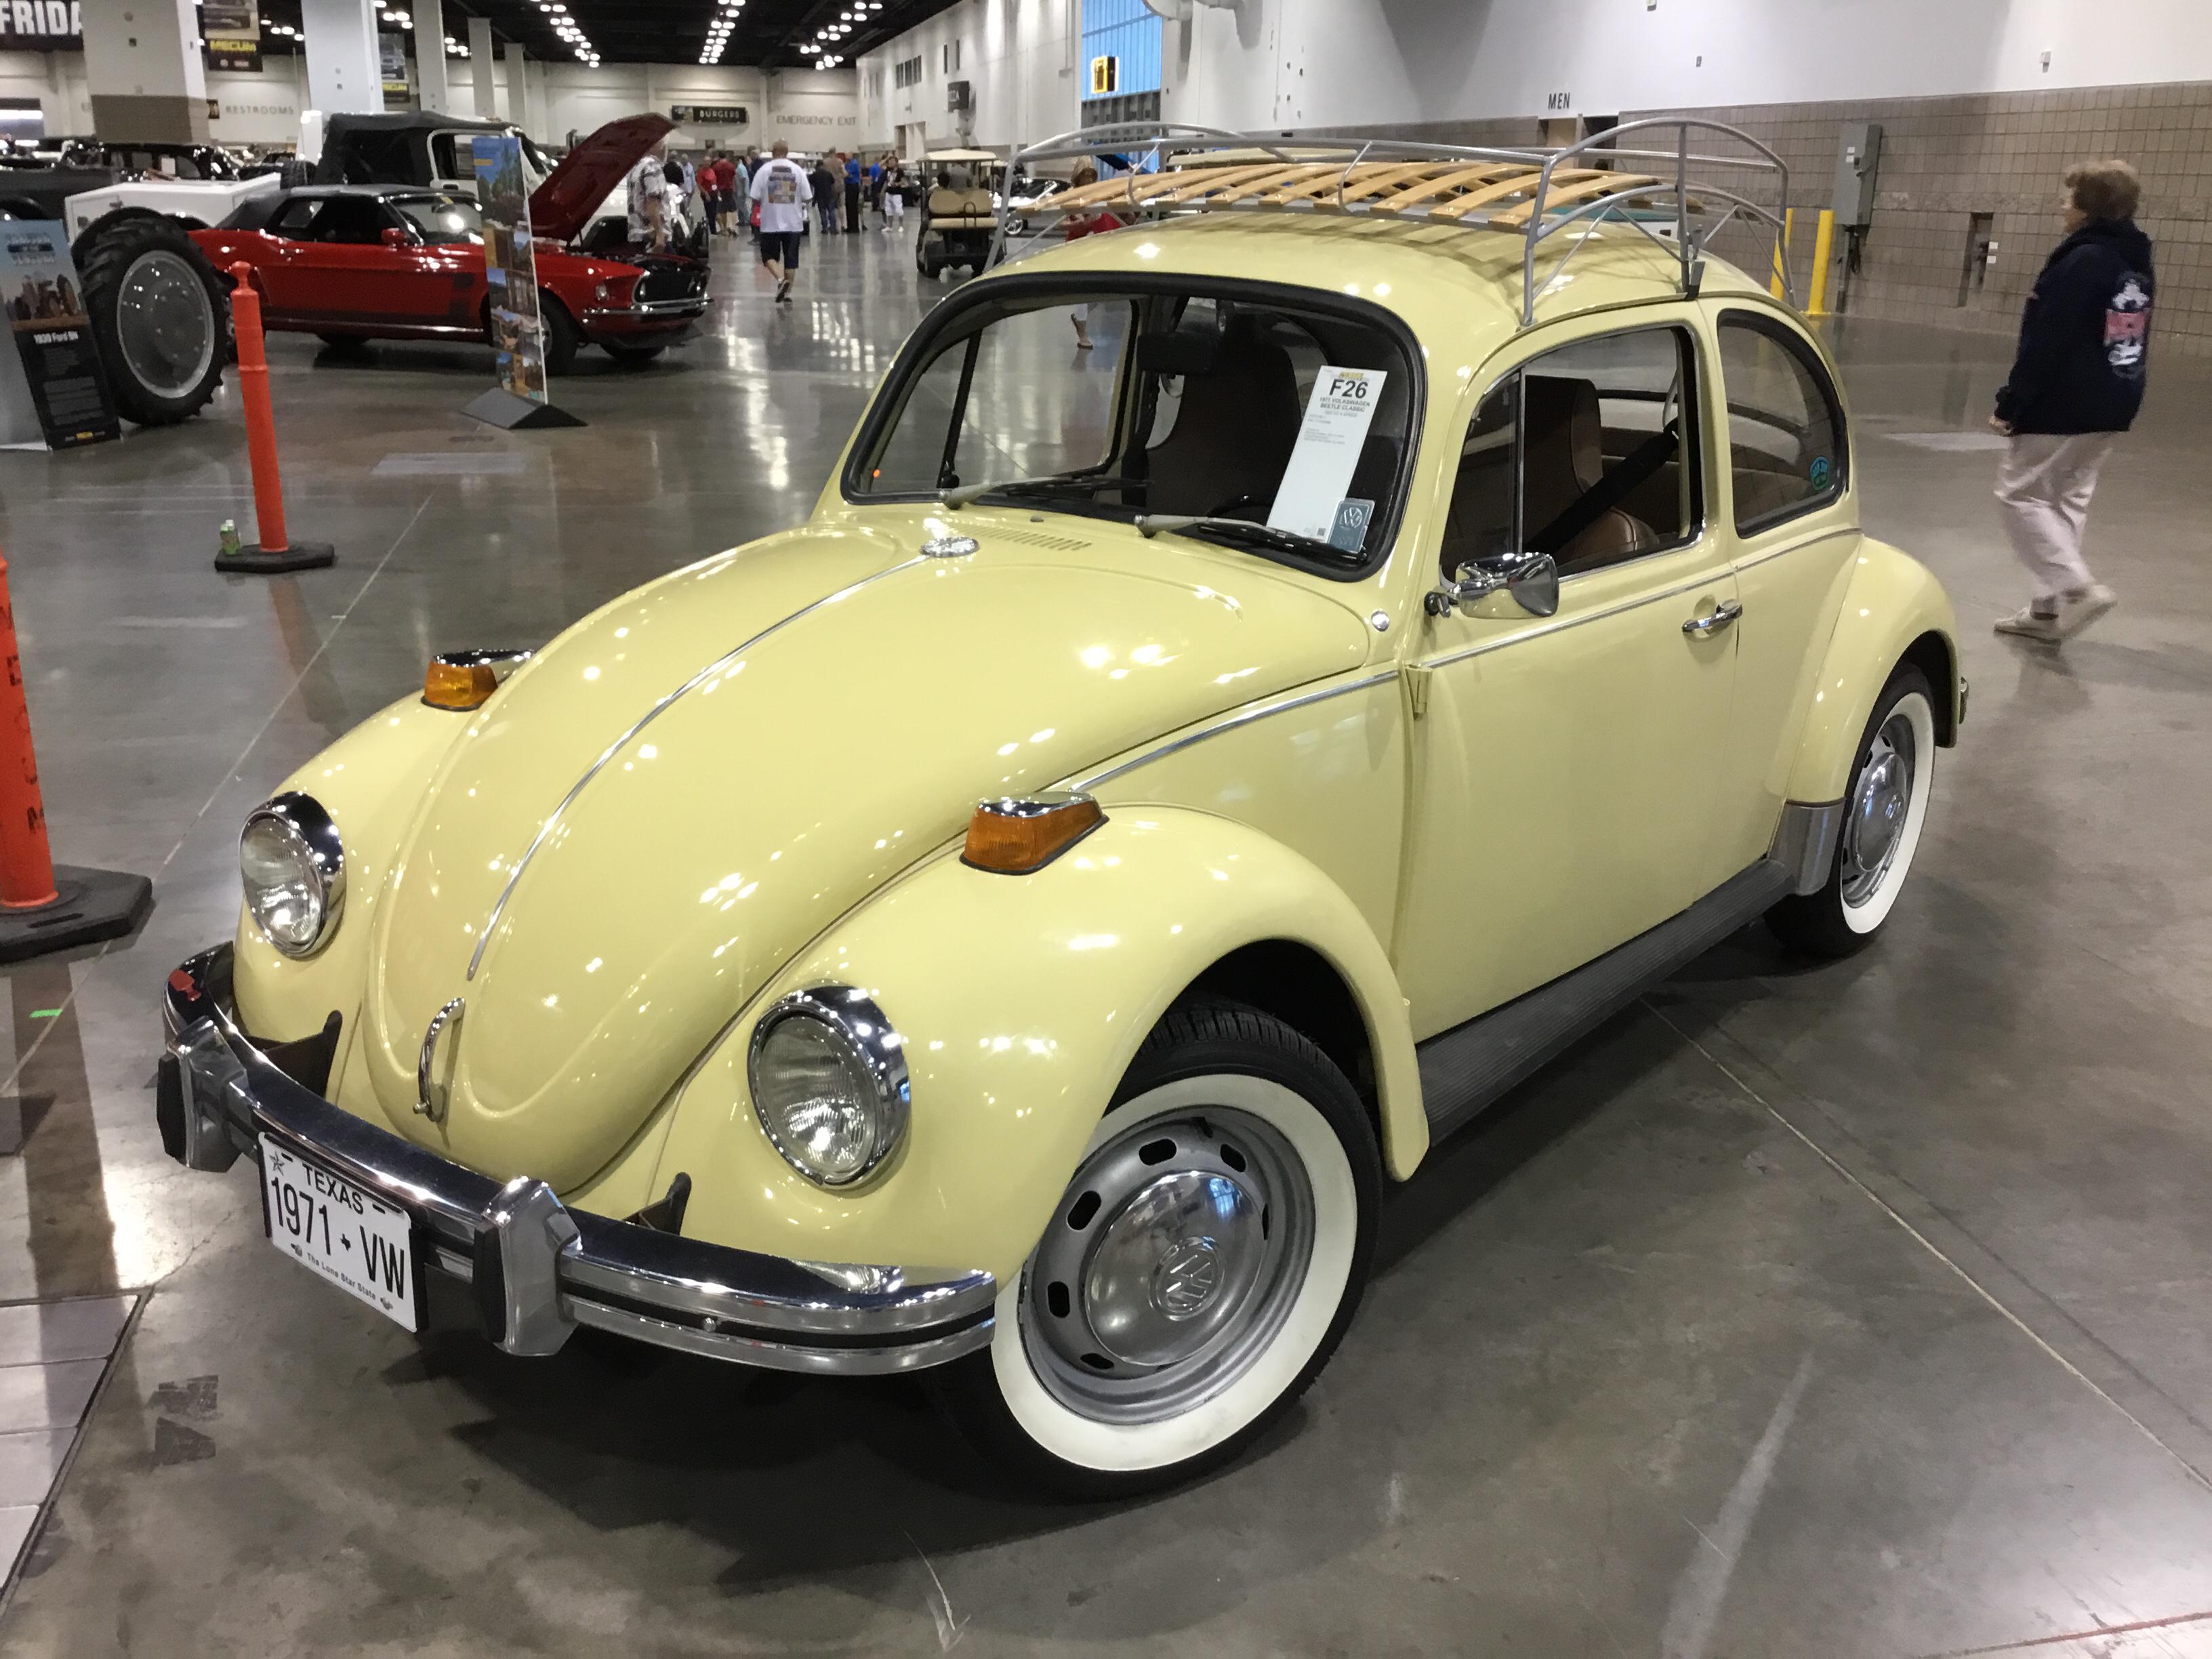 1971 Volkswagen Beetle Values Hagerty Valuation Tool